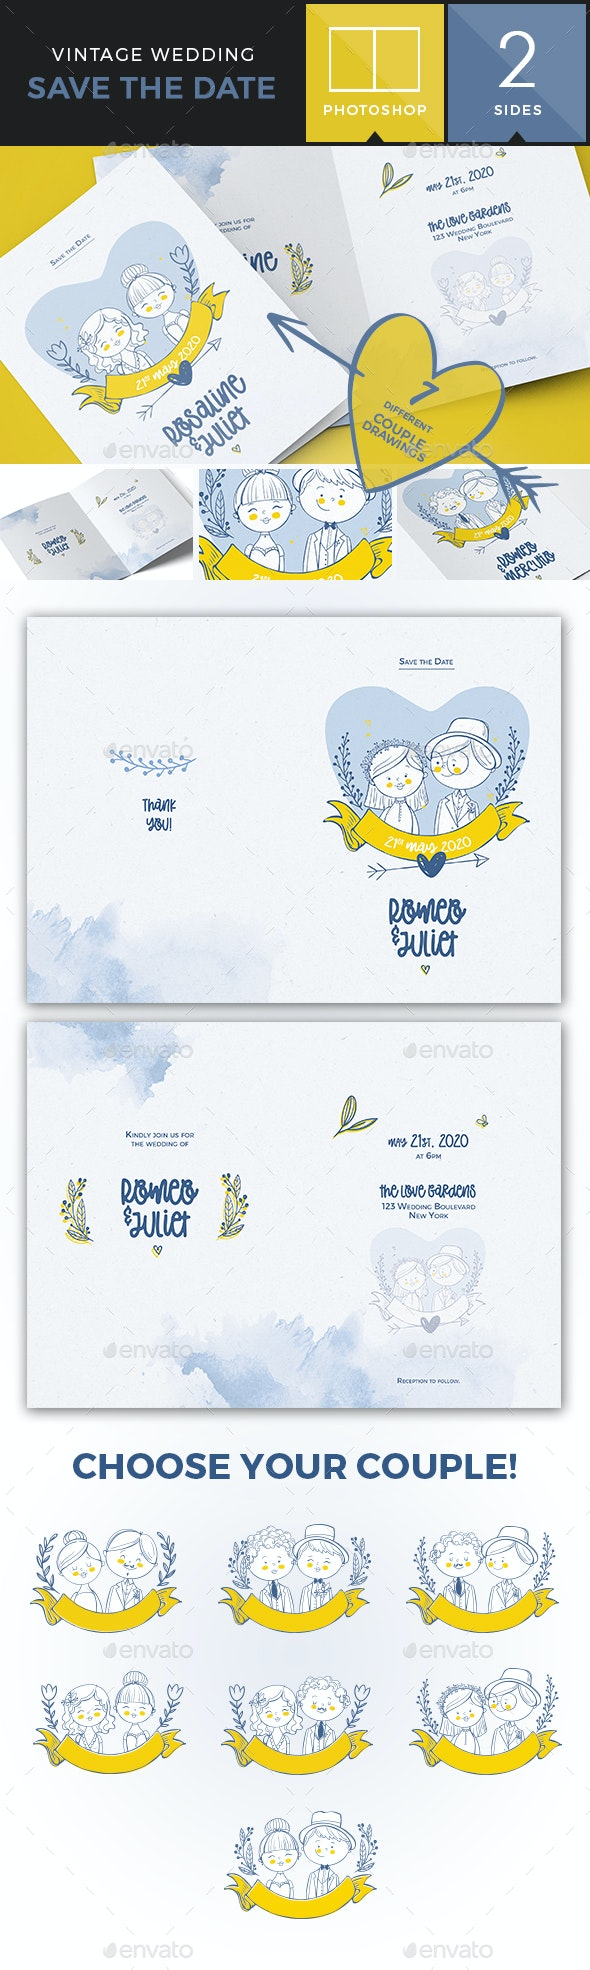 Illustrated Save the Date / Wedding Invitation - Bifold - Weddings Cards & Invites